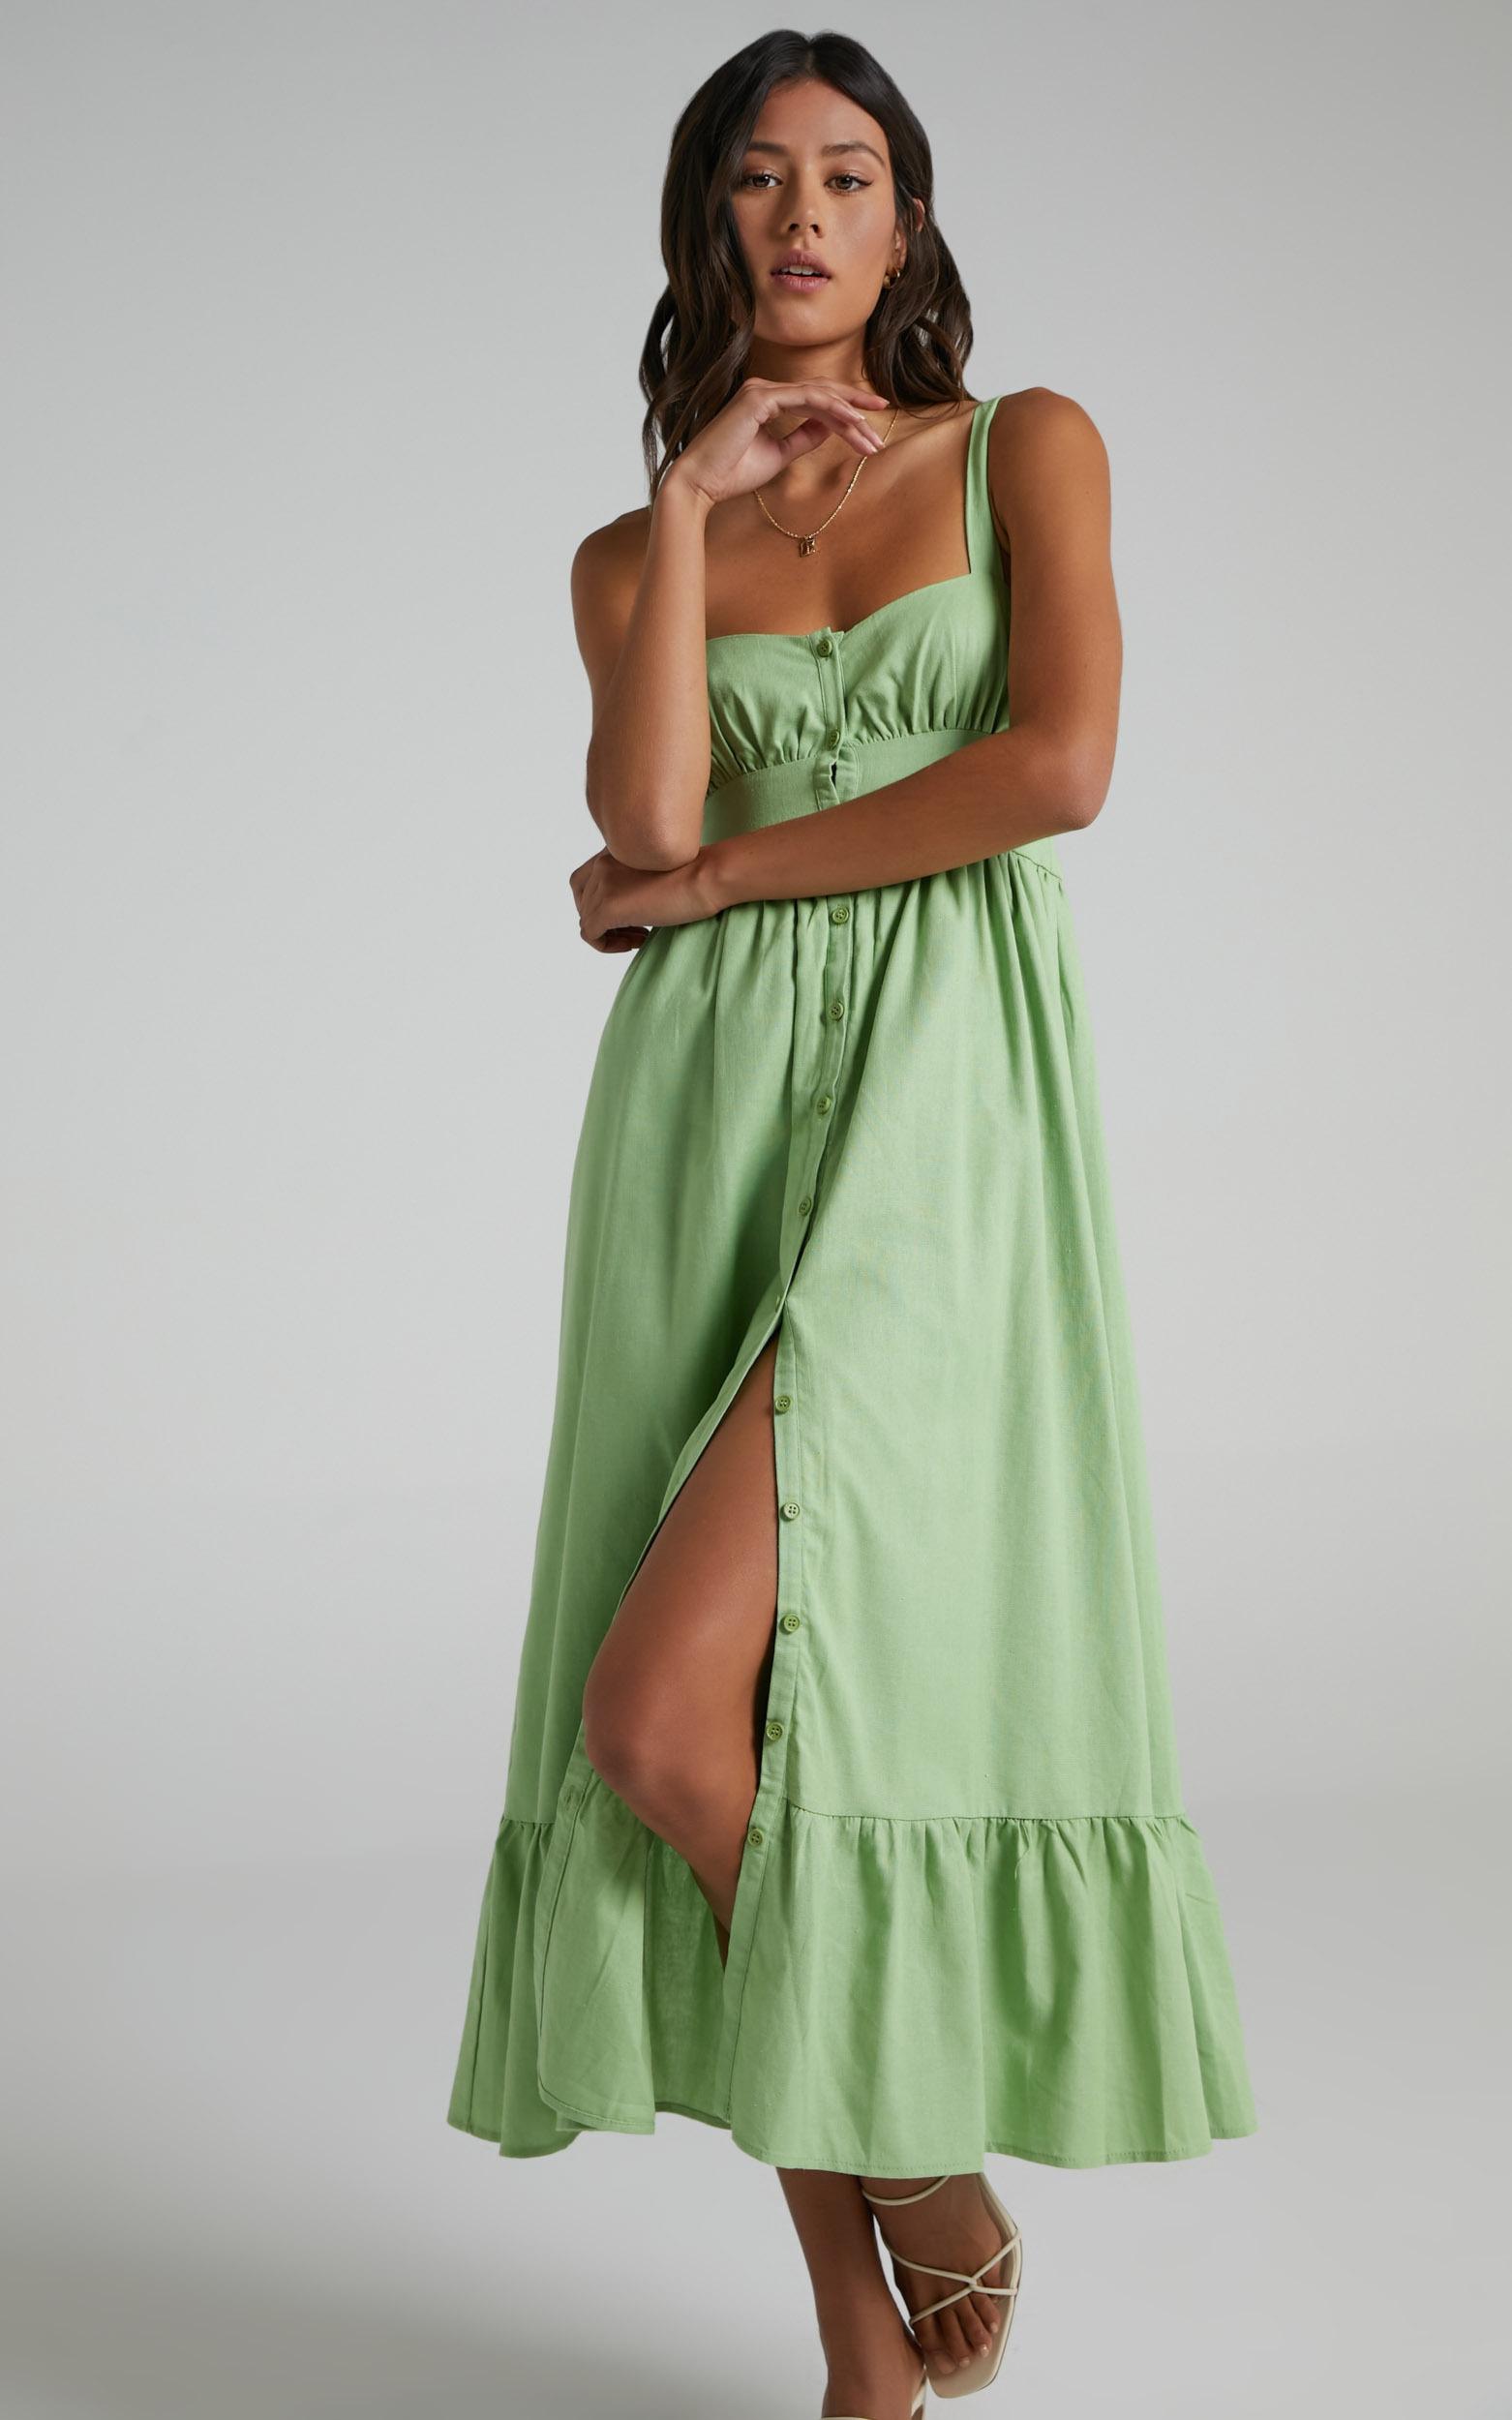 Marvina Dress in Green - 06, GRN2, hi-res image number null